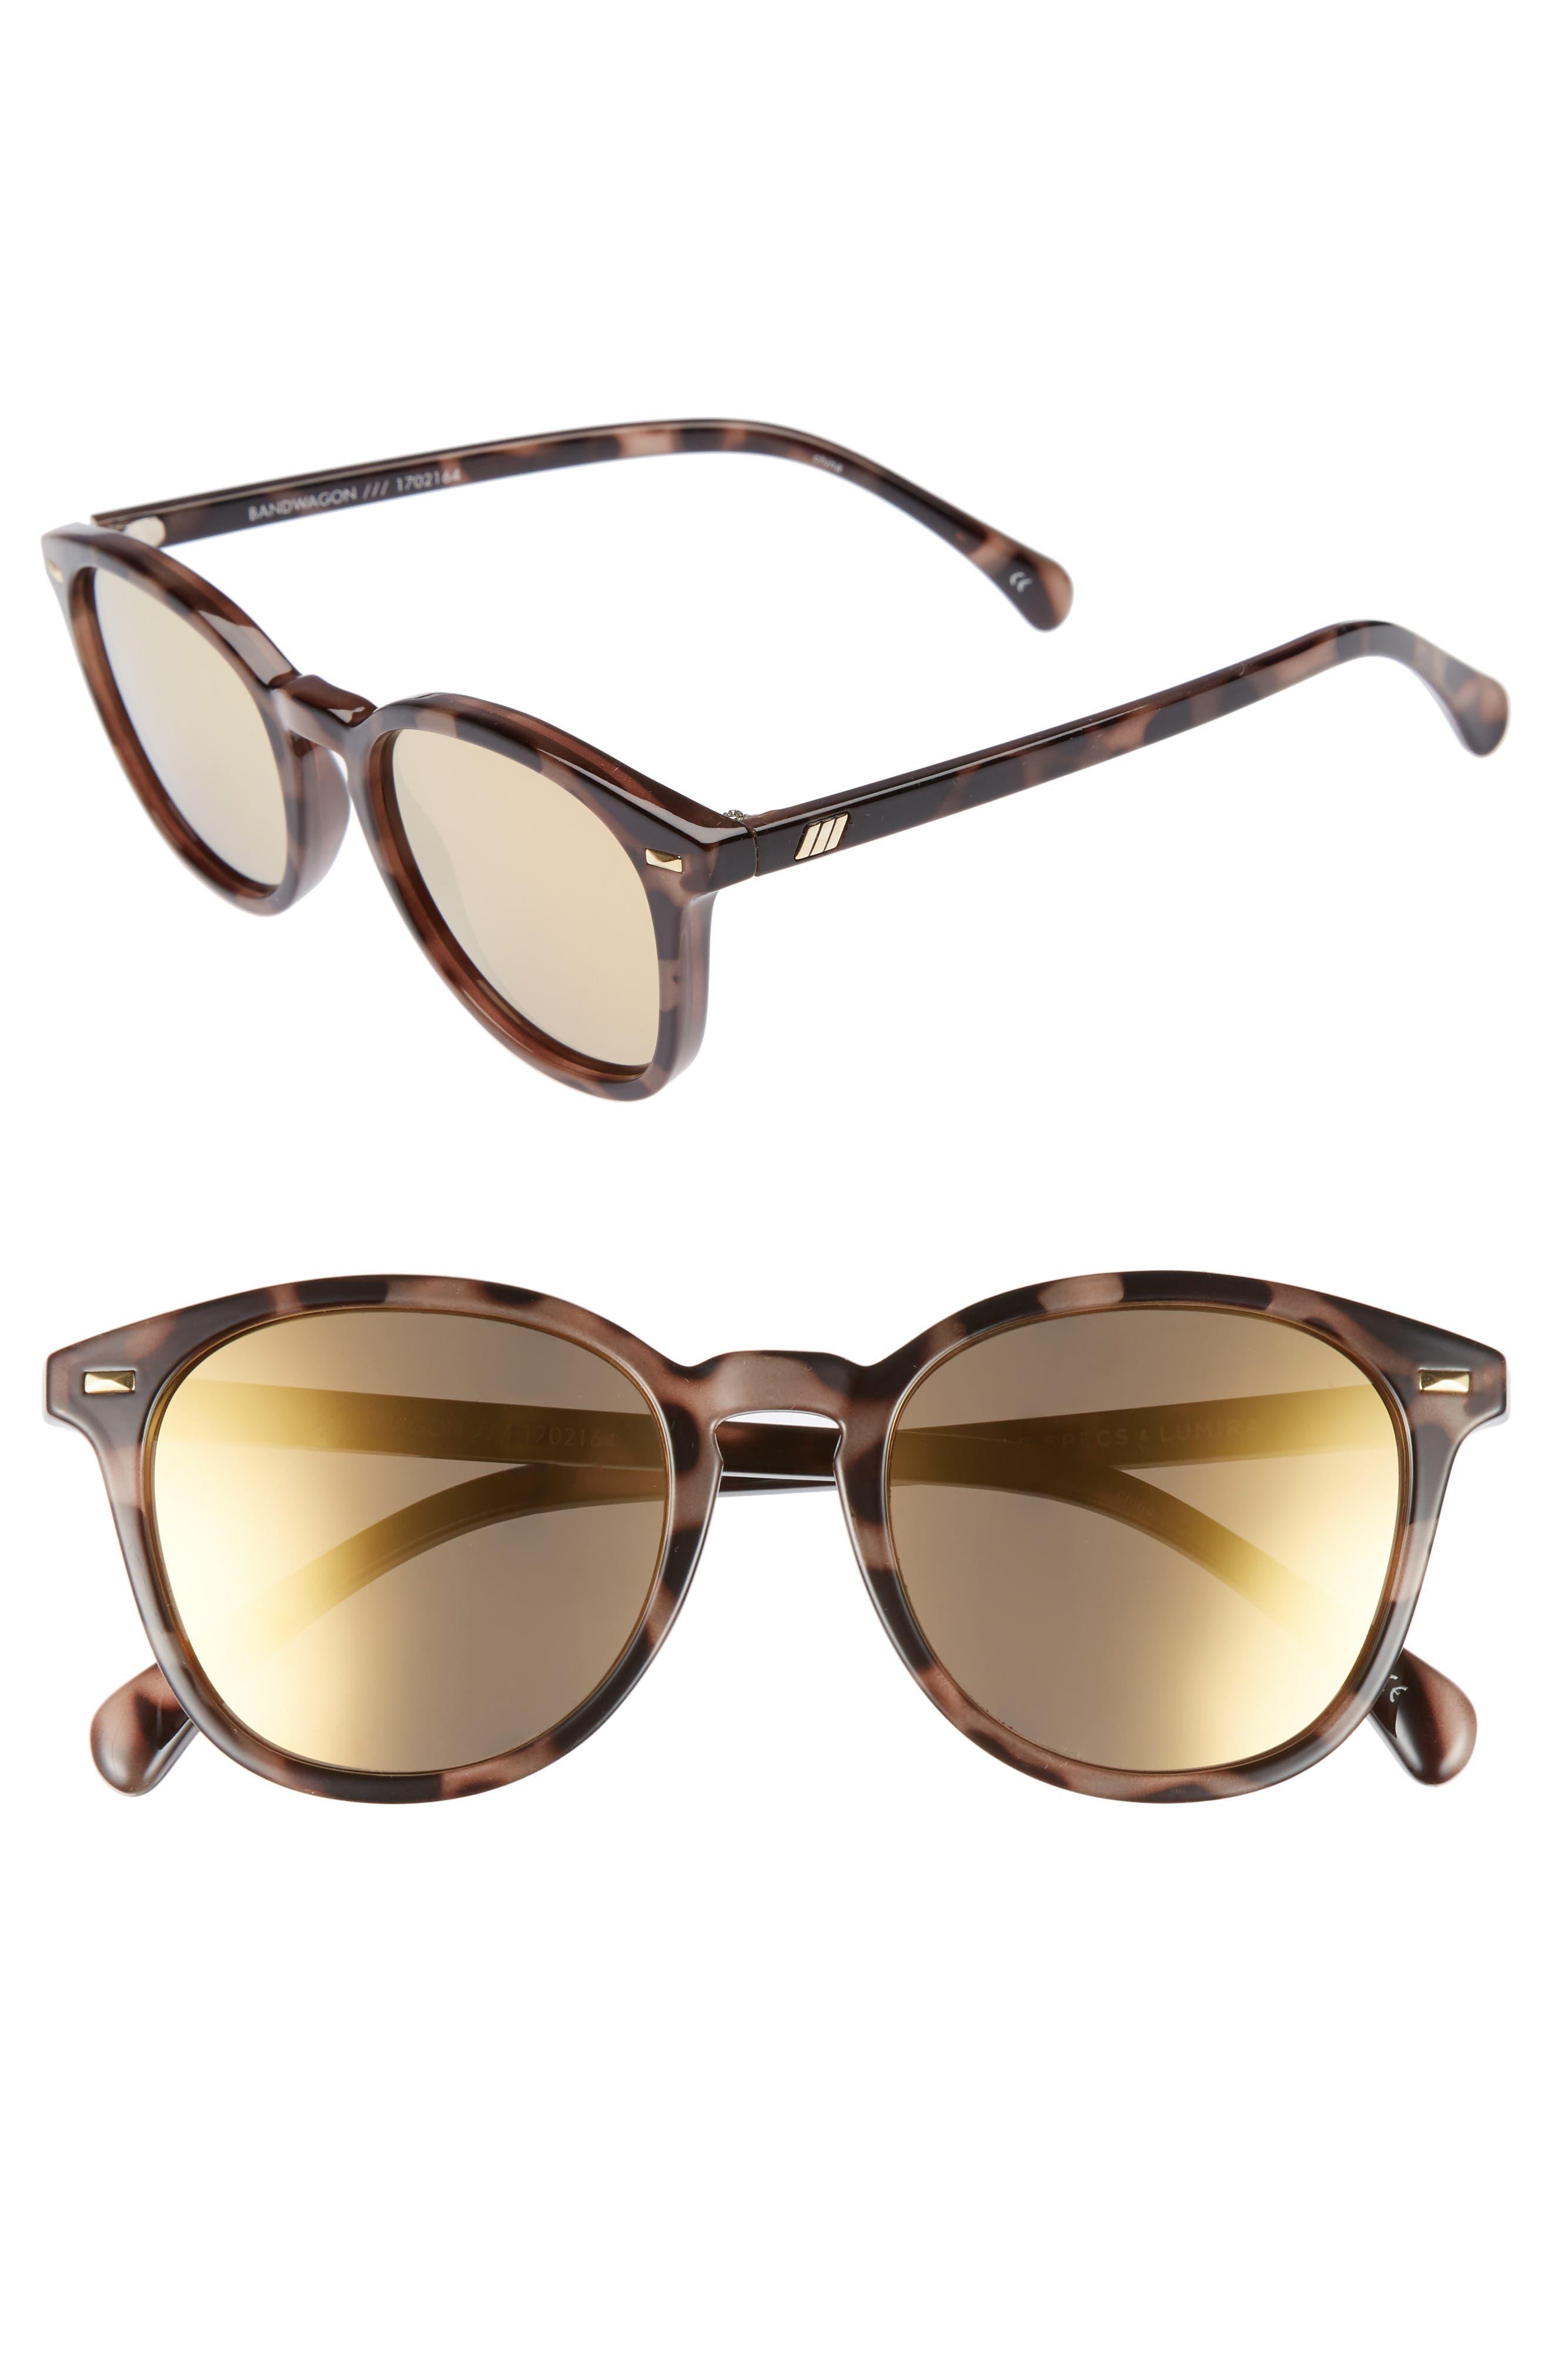 x Lumira Bandwagon 51mm Sunglasses & Candle Gift Set,                         Main,                         color, Volcanic Tort